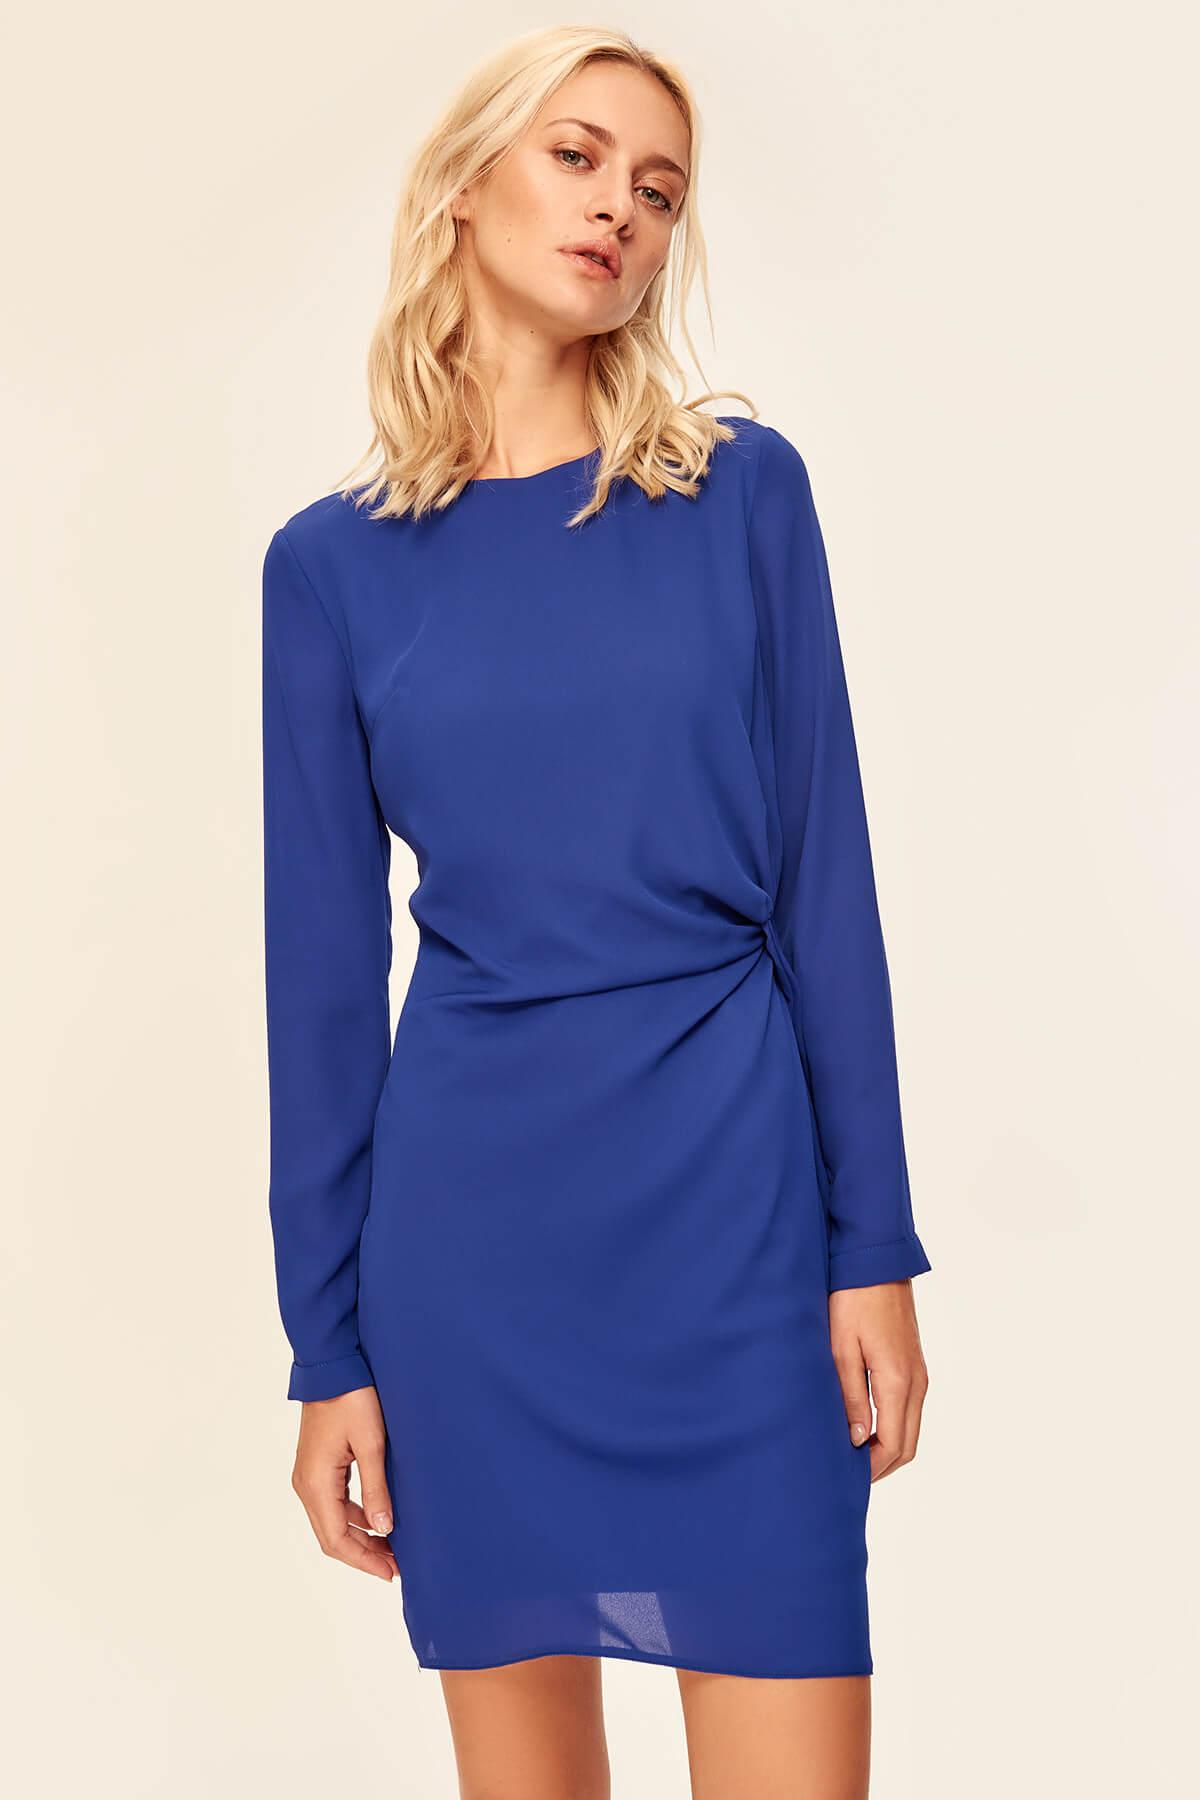 Trendyol TOFAW19BB0419 ruffles Blue Dress